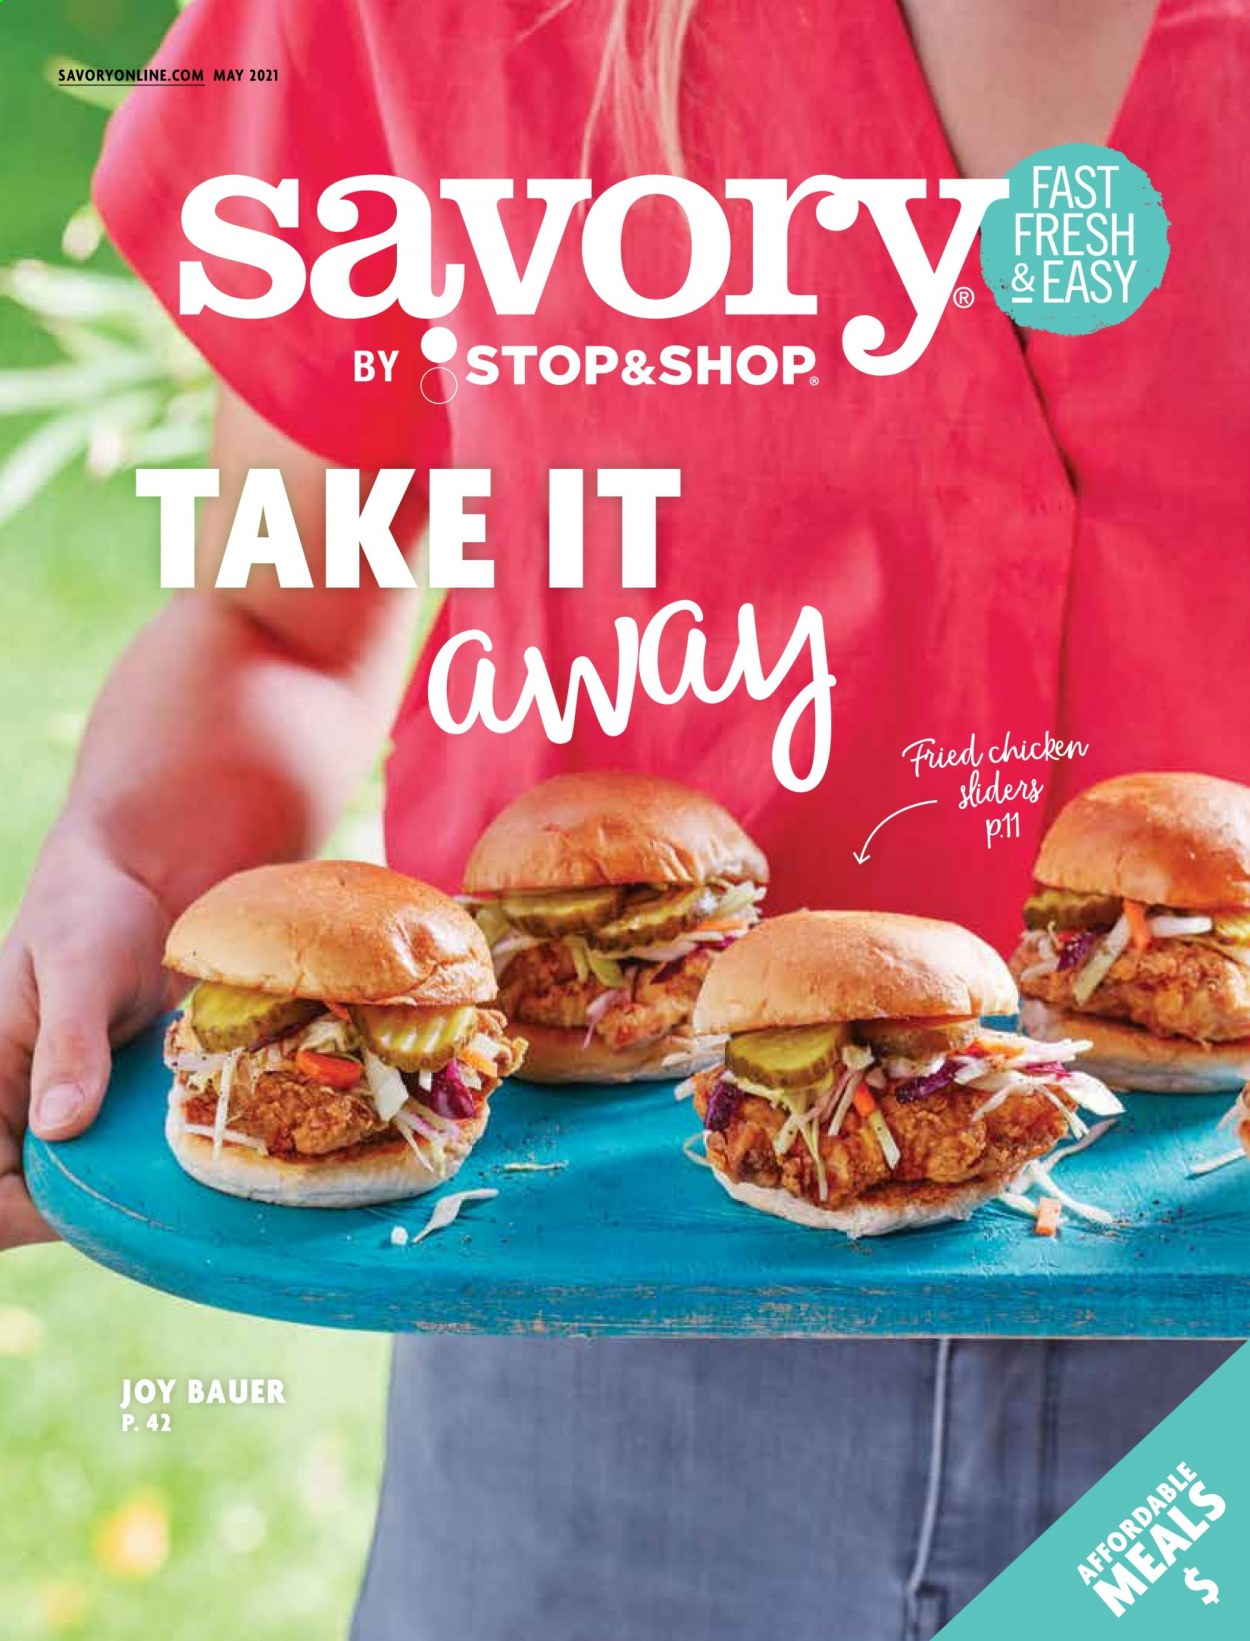 Stop&Shop Savory Magazine - May 2021